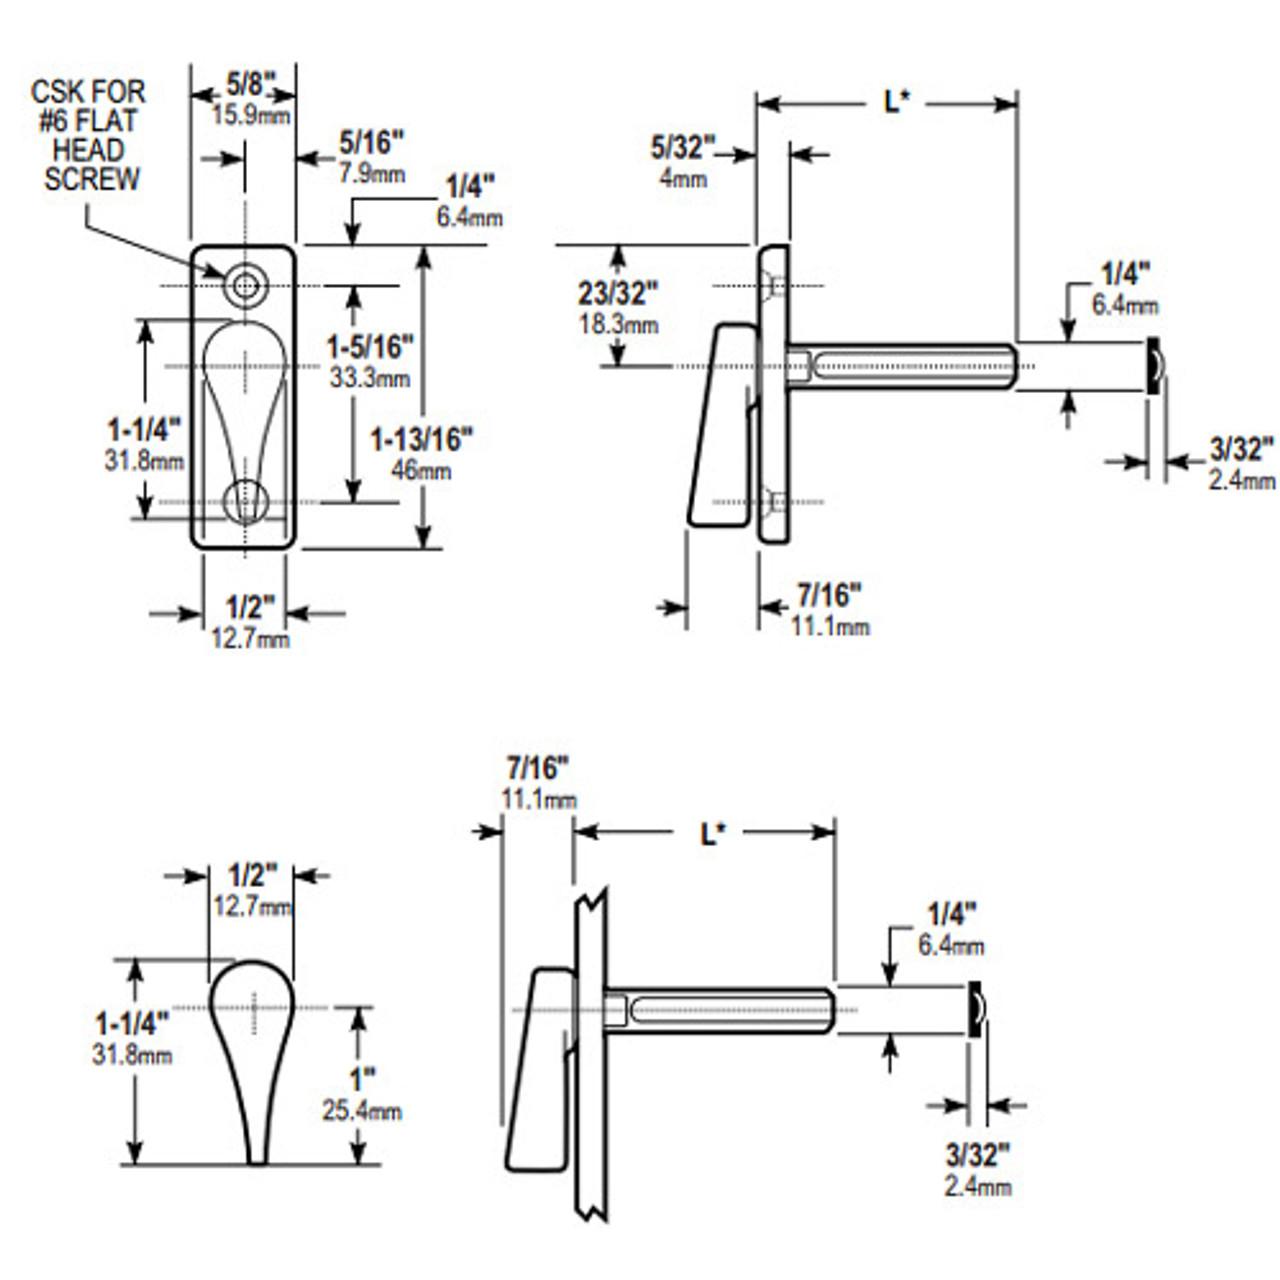 1000-21-13-130 Adams Rite 1000 Series Turns Dimensional View